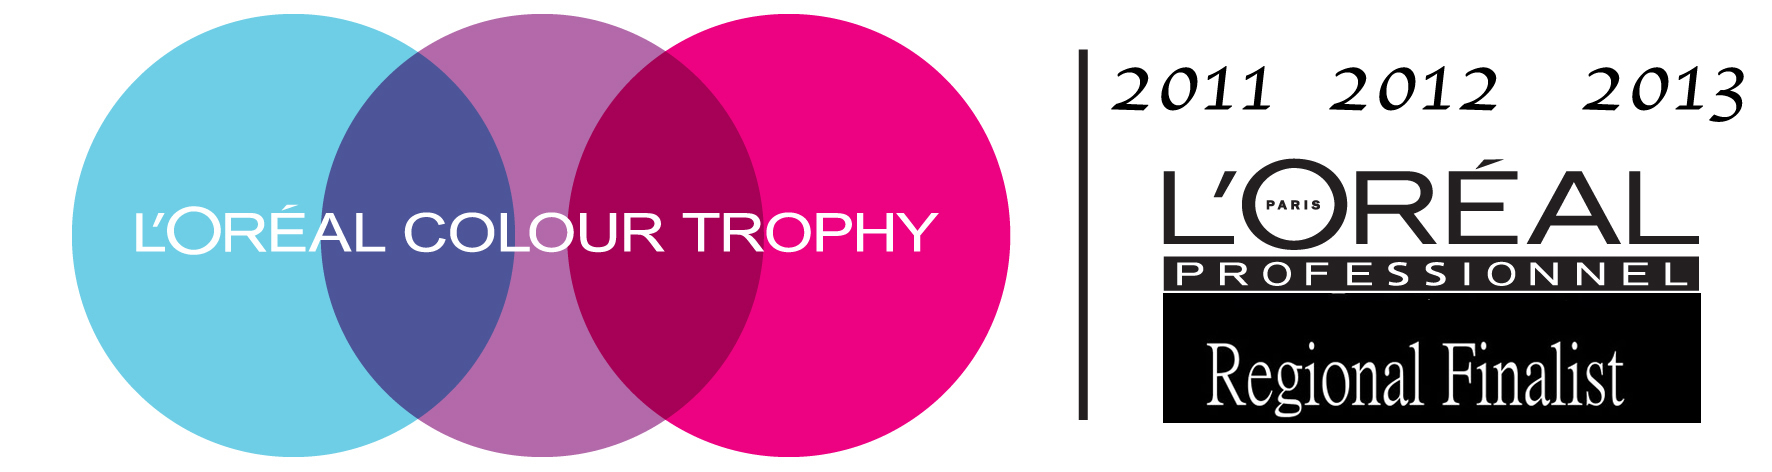 trophy 11 12 13